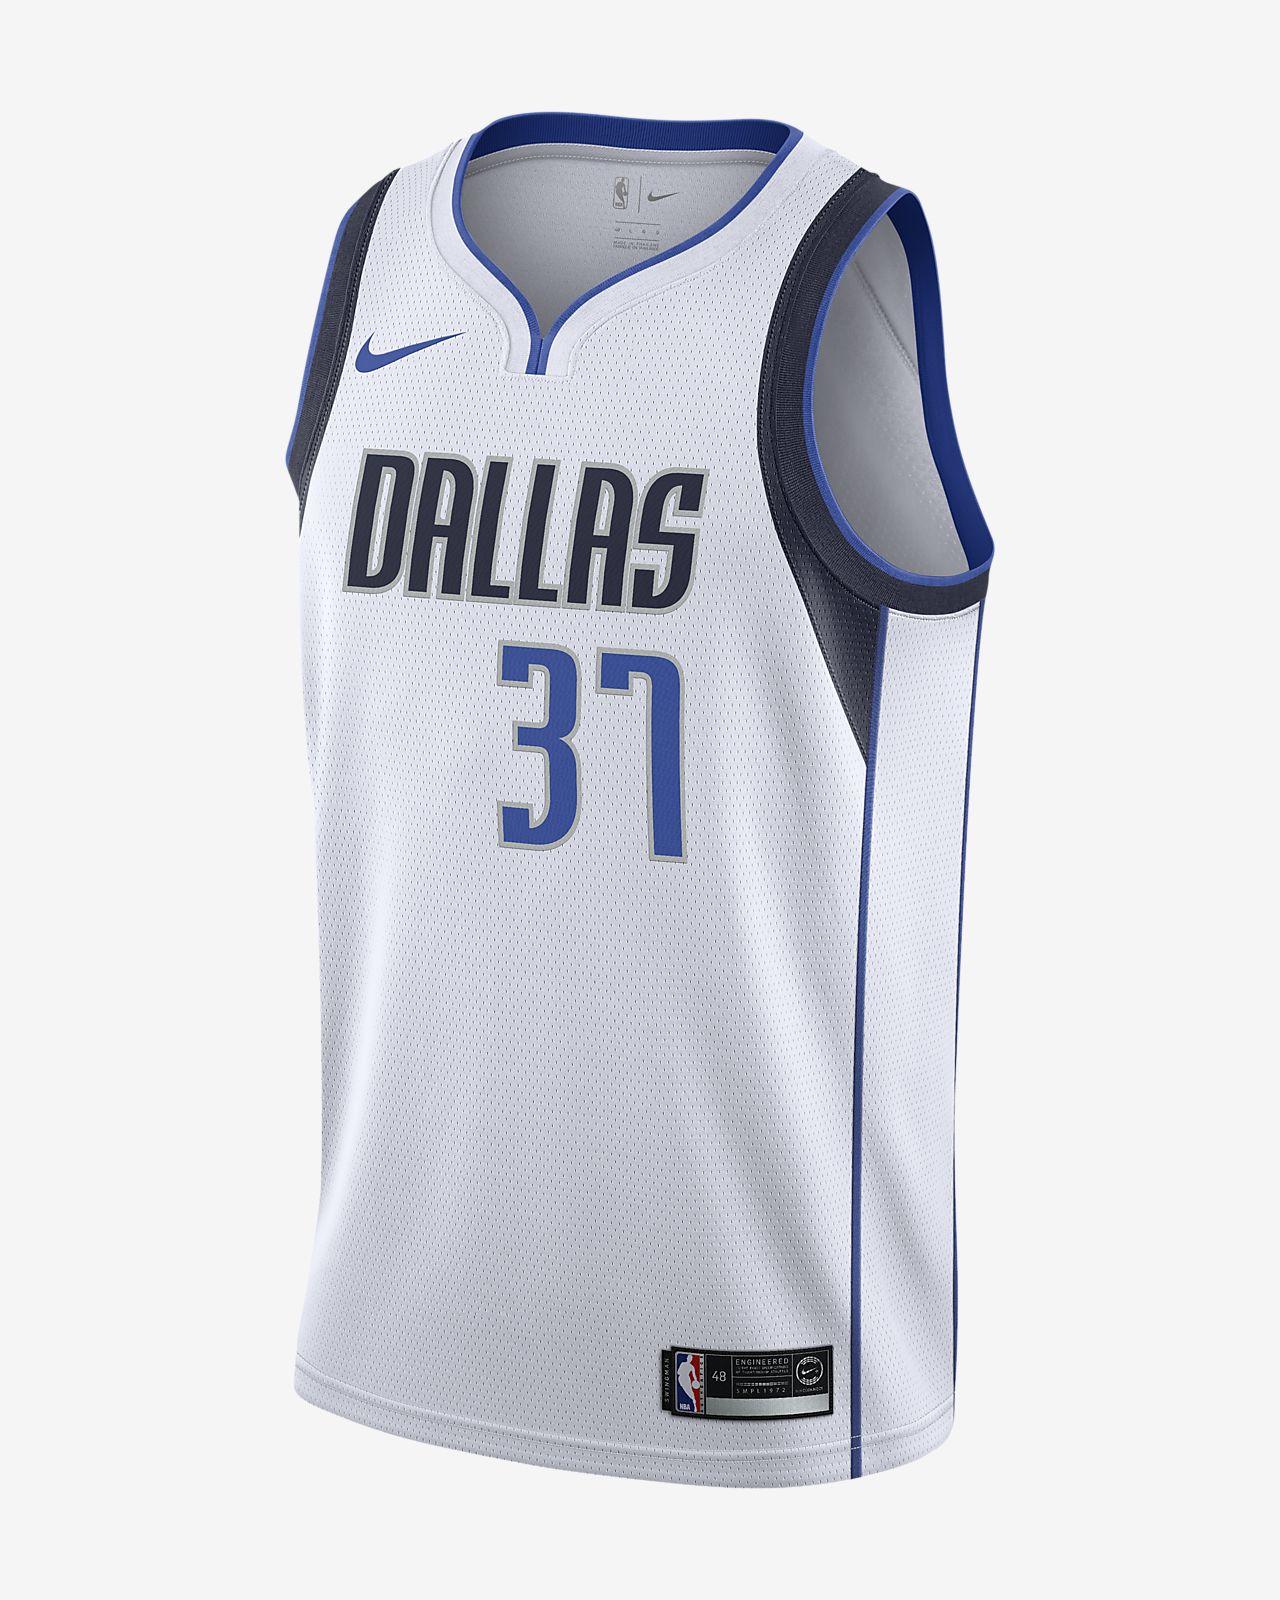 Pánský dres Nike NBA Connected Kostas Antetokounmpo Association Edition Swingman (Dallas Mavericks)